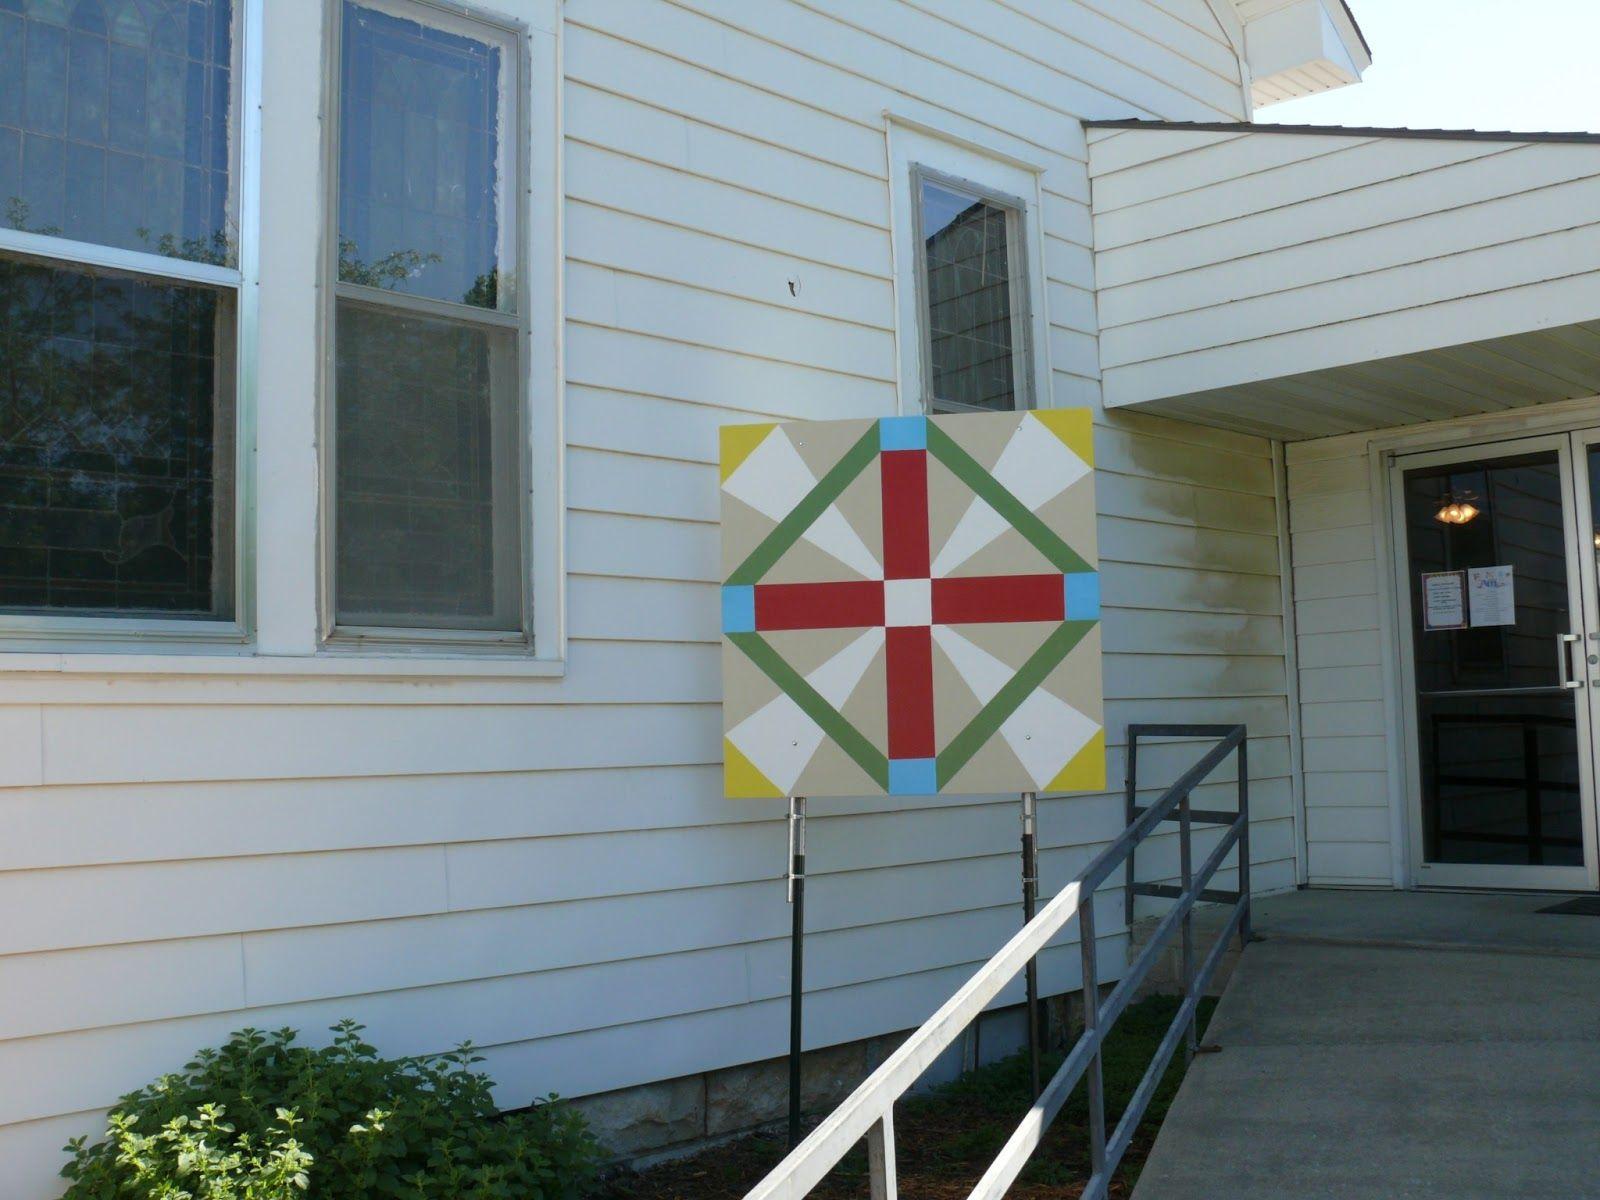 Kansas morris county dwight - Kansas Flint Hills Quilt Trail Morris County God Loves Dwight United Methodist